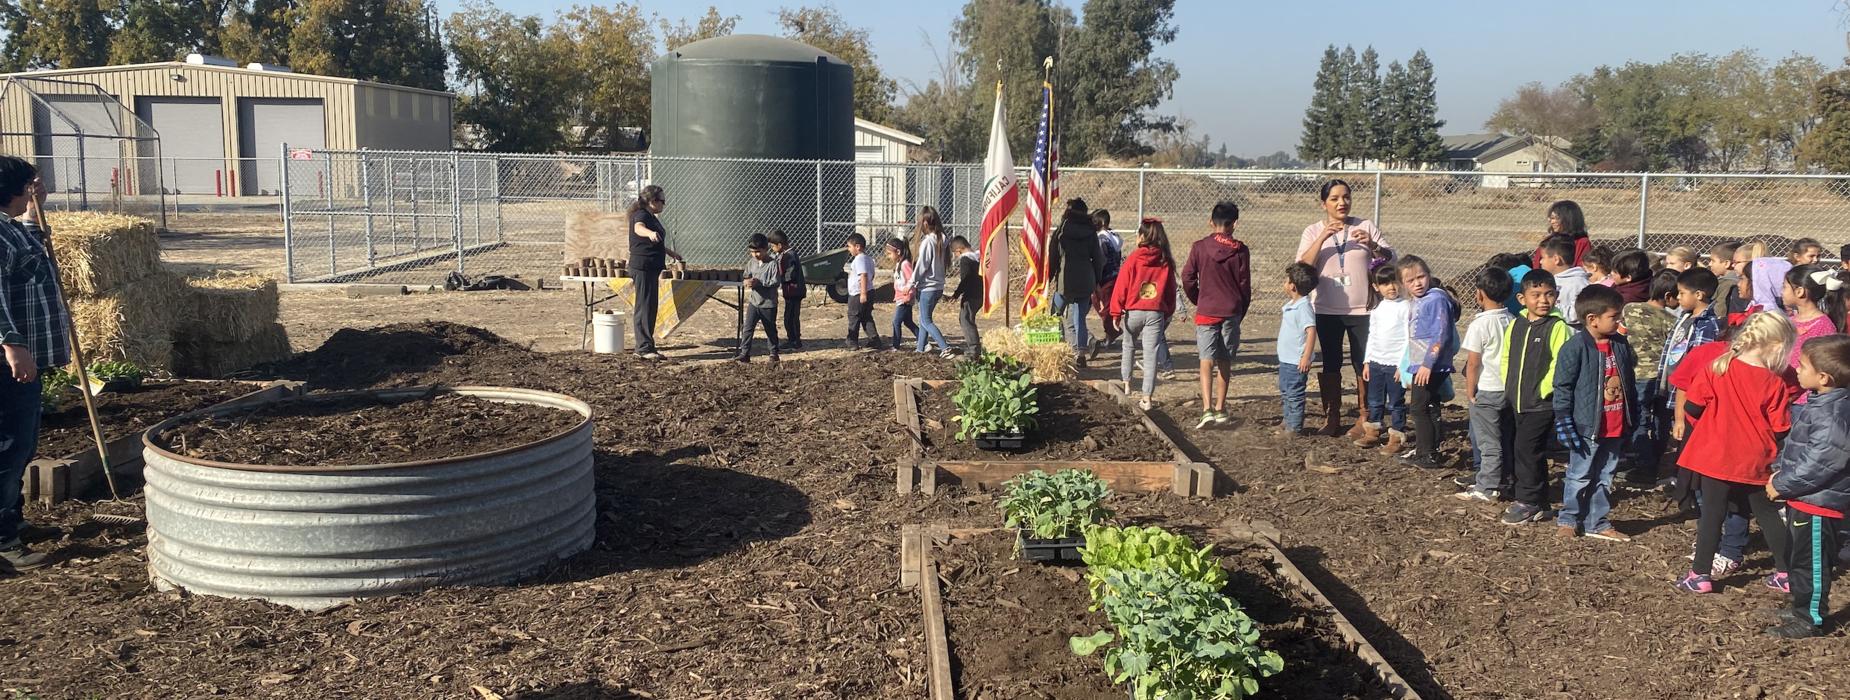 Groundbreaking ceremony for the Collegeville garden